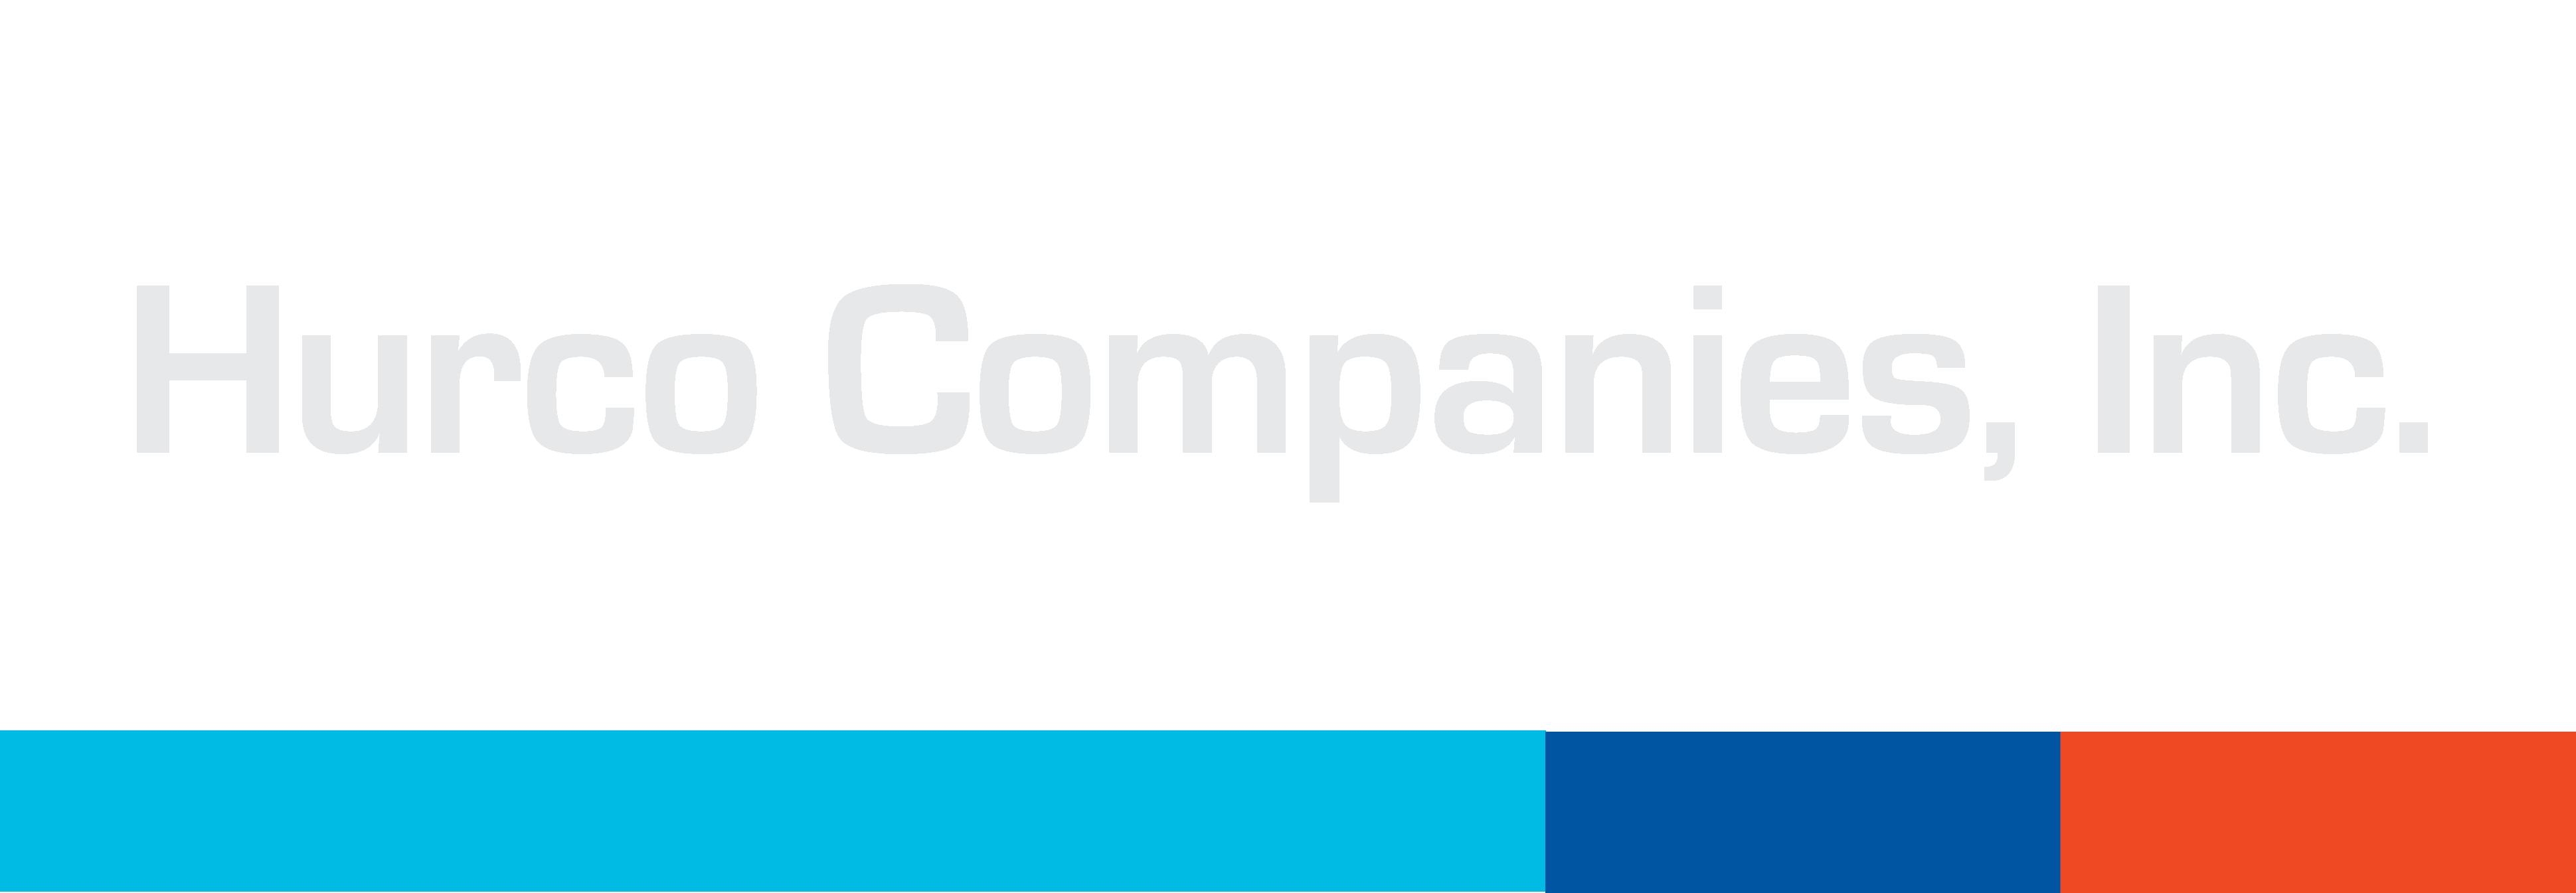 Hurco-Corporate-Logo_HCI_copy_2.png